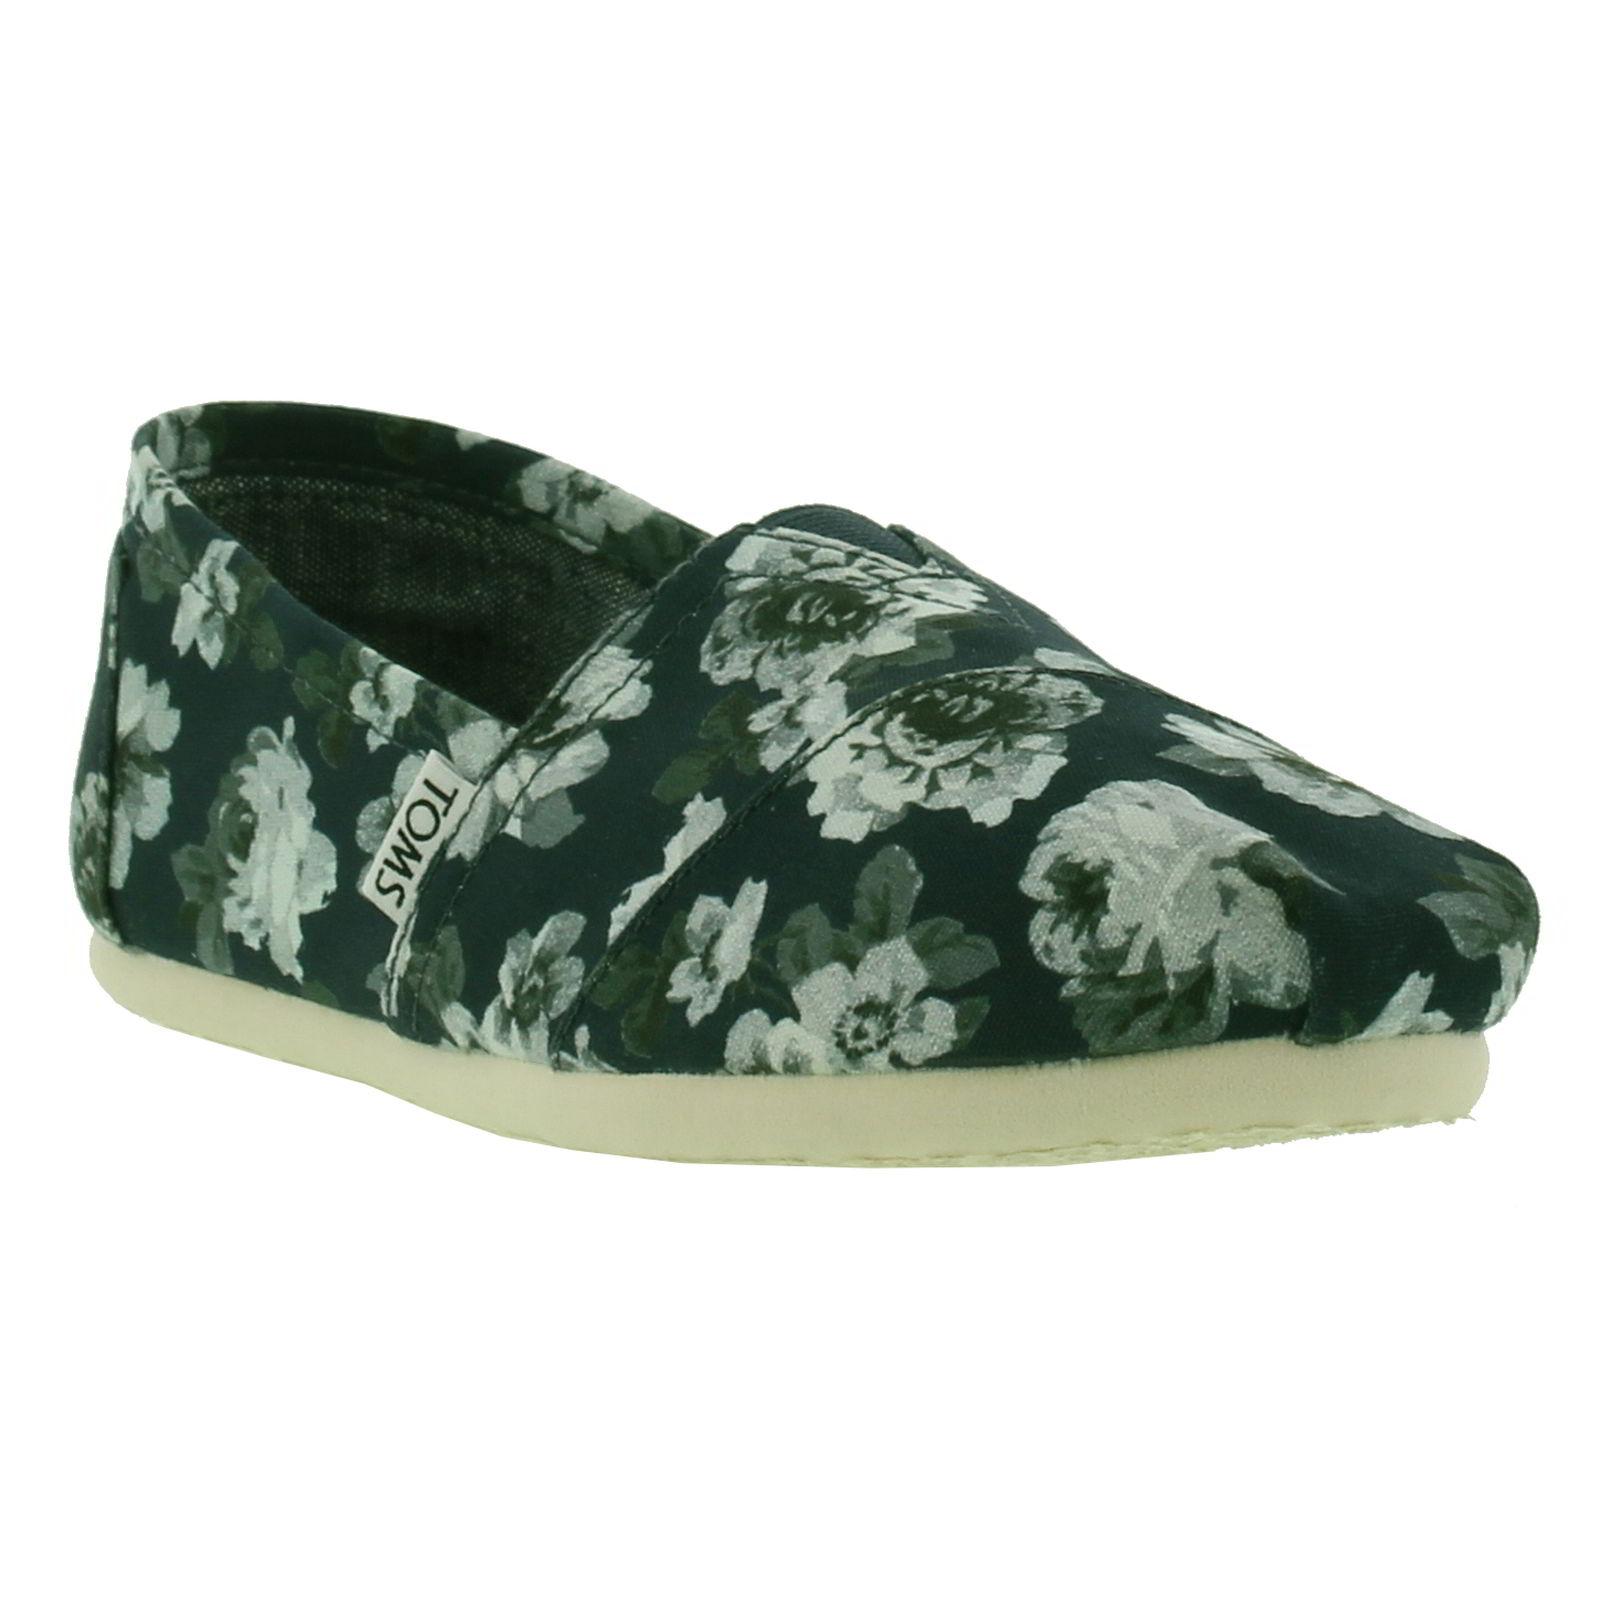 Toms Womens Classics Alpargata Espadrille - Navy Grey Floral